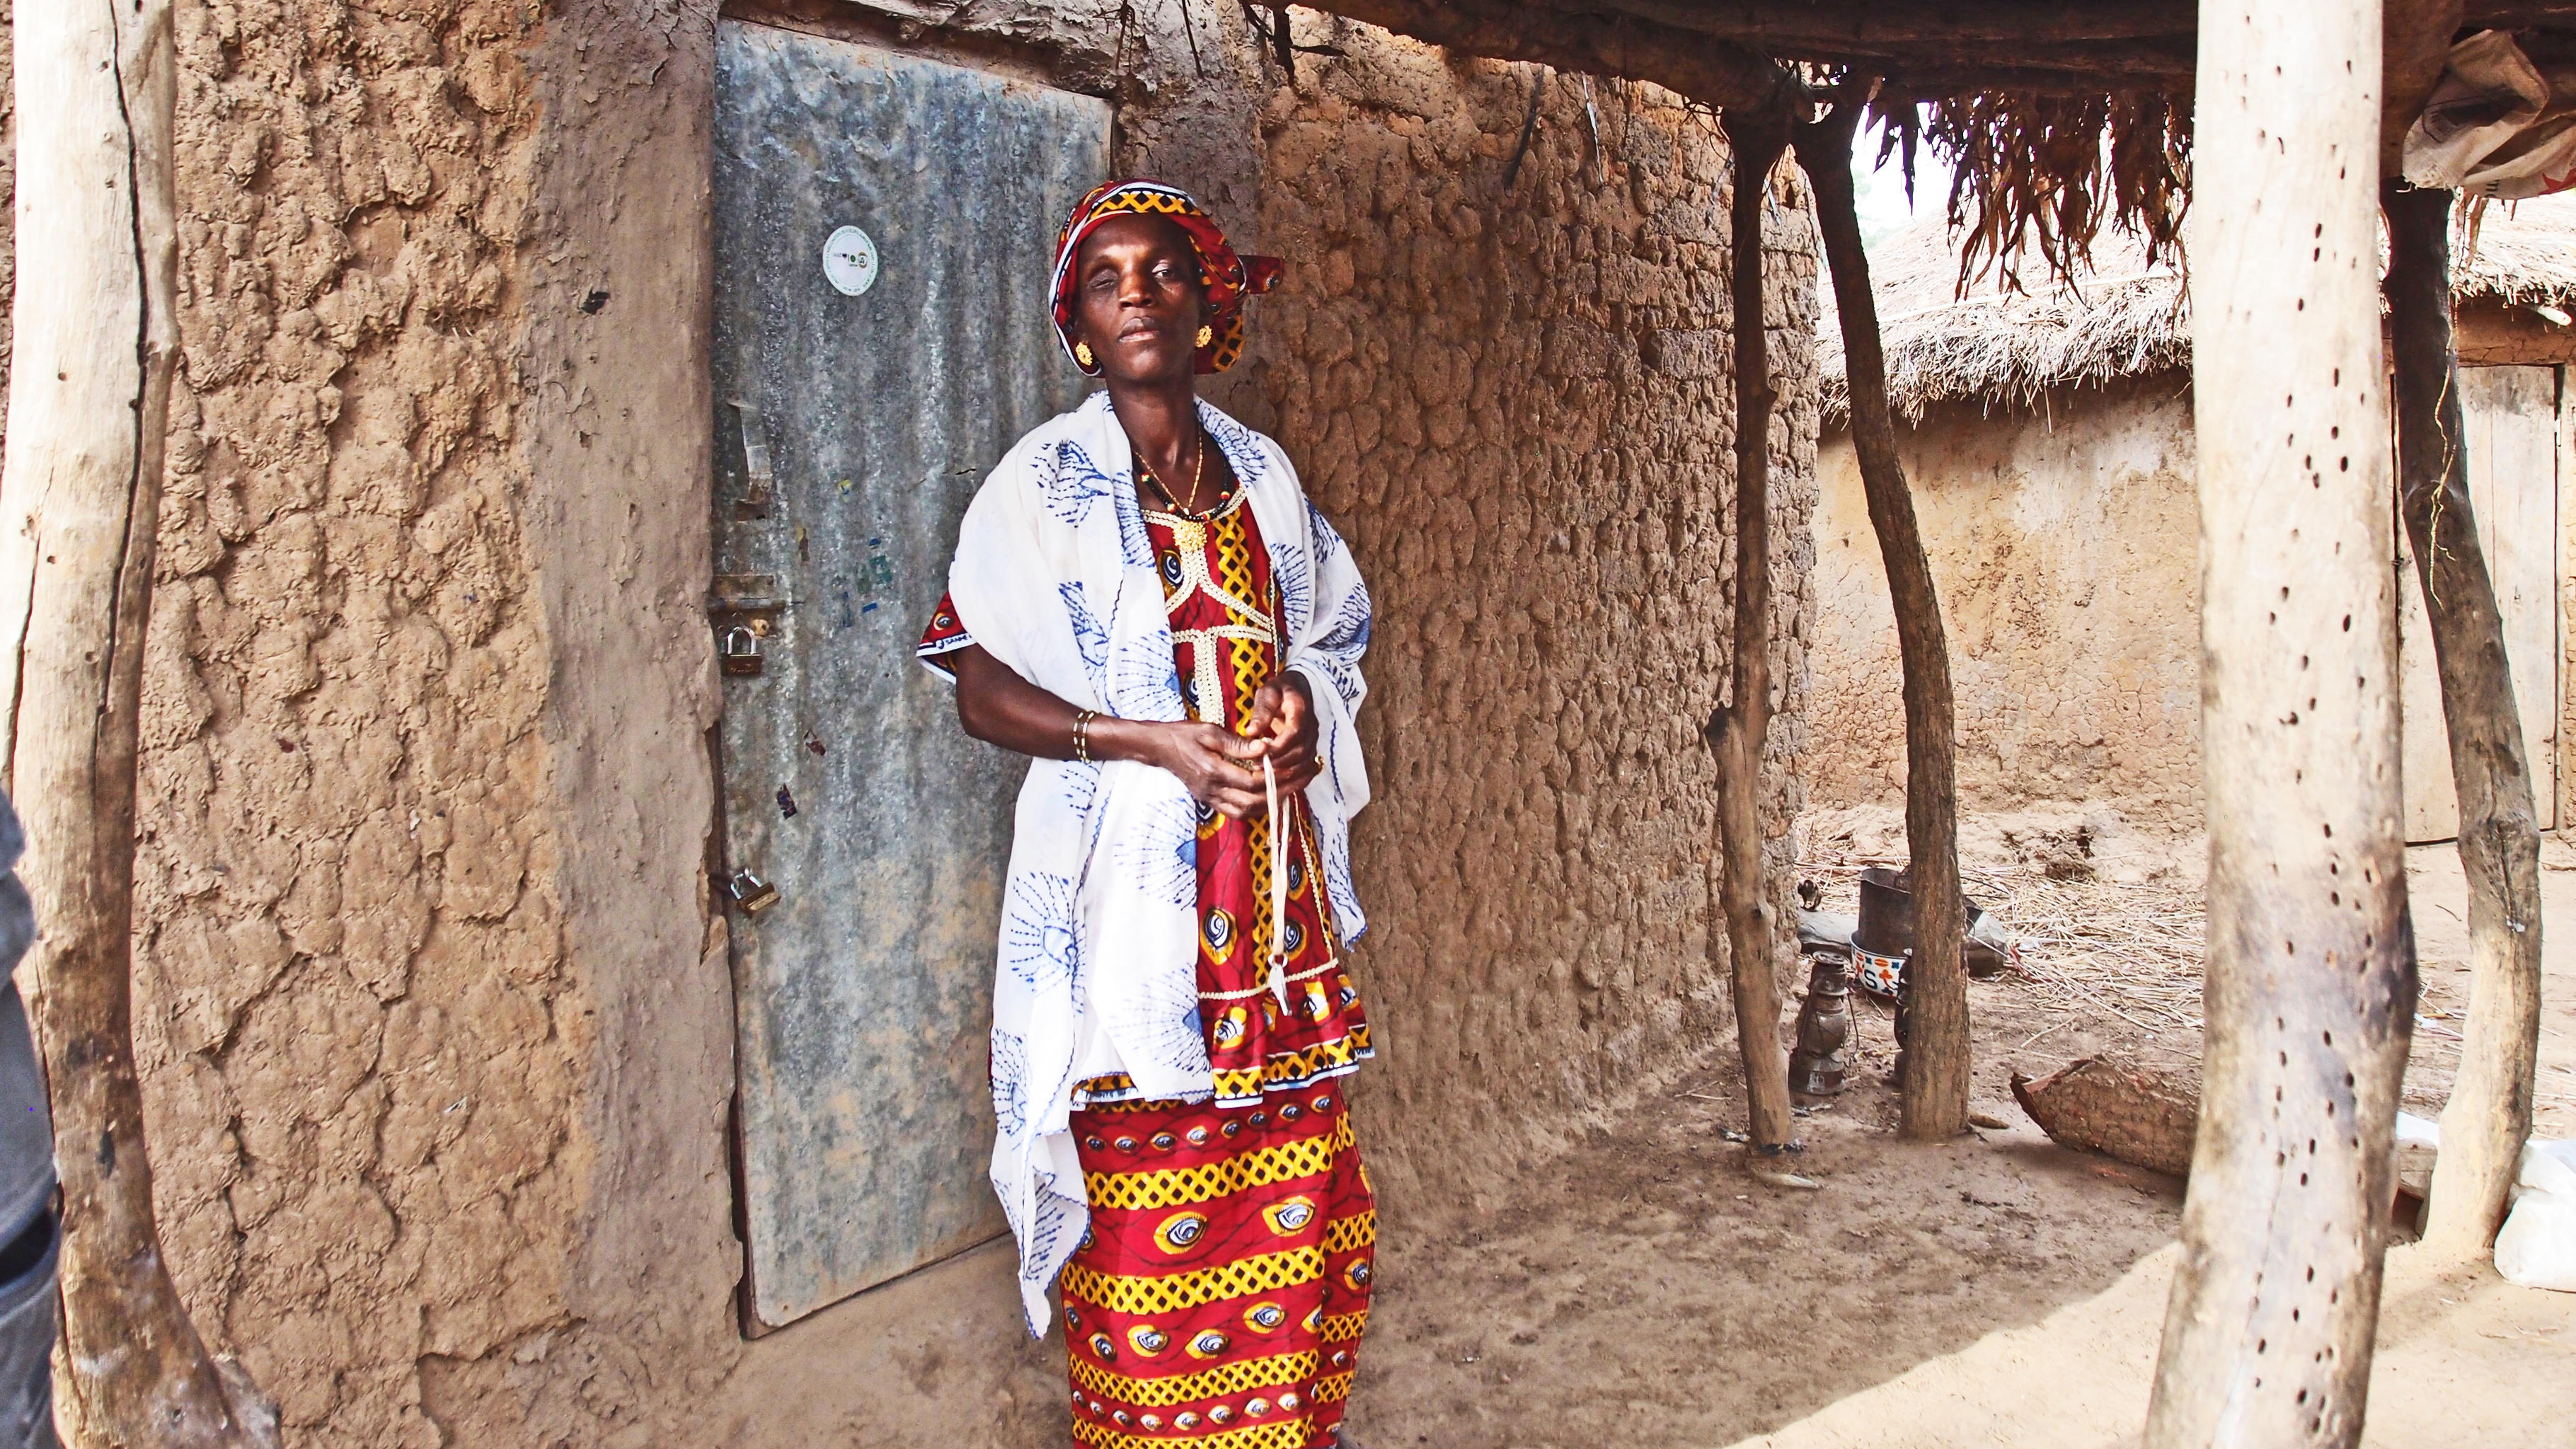 Schlüsselwärtin Dossou Sidibé steht vor dem Getreidelager